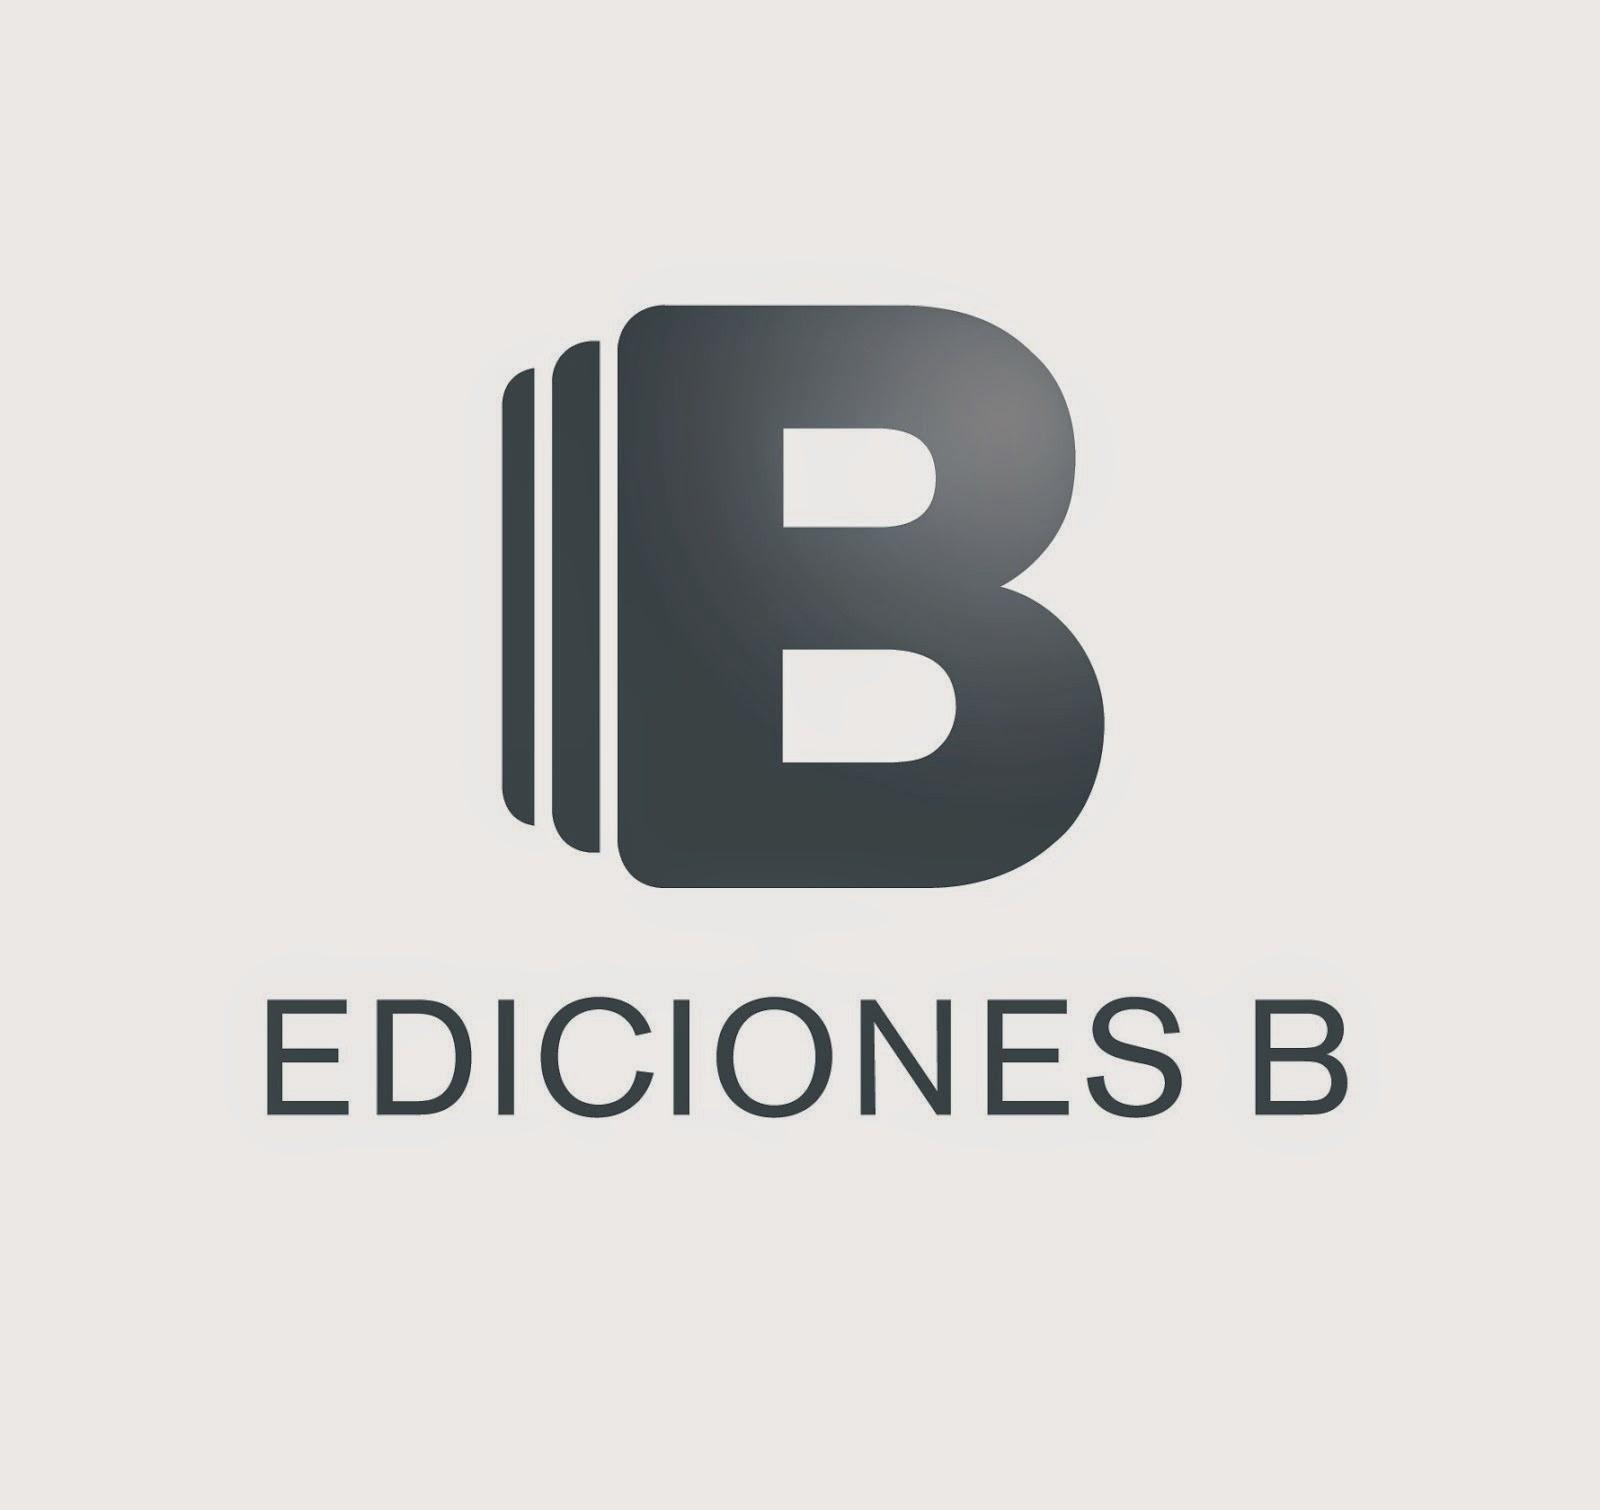 Ediciones B Argentina